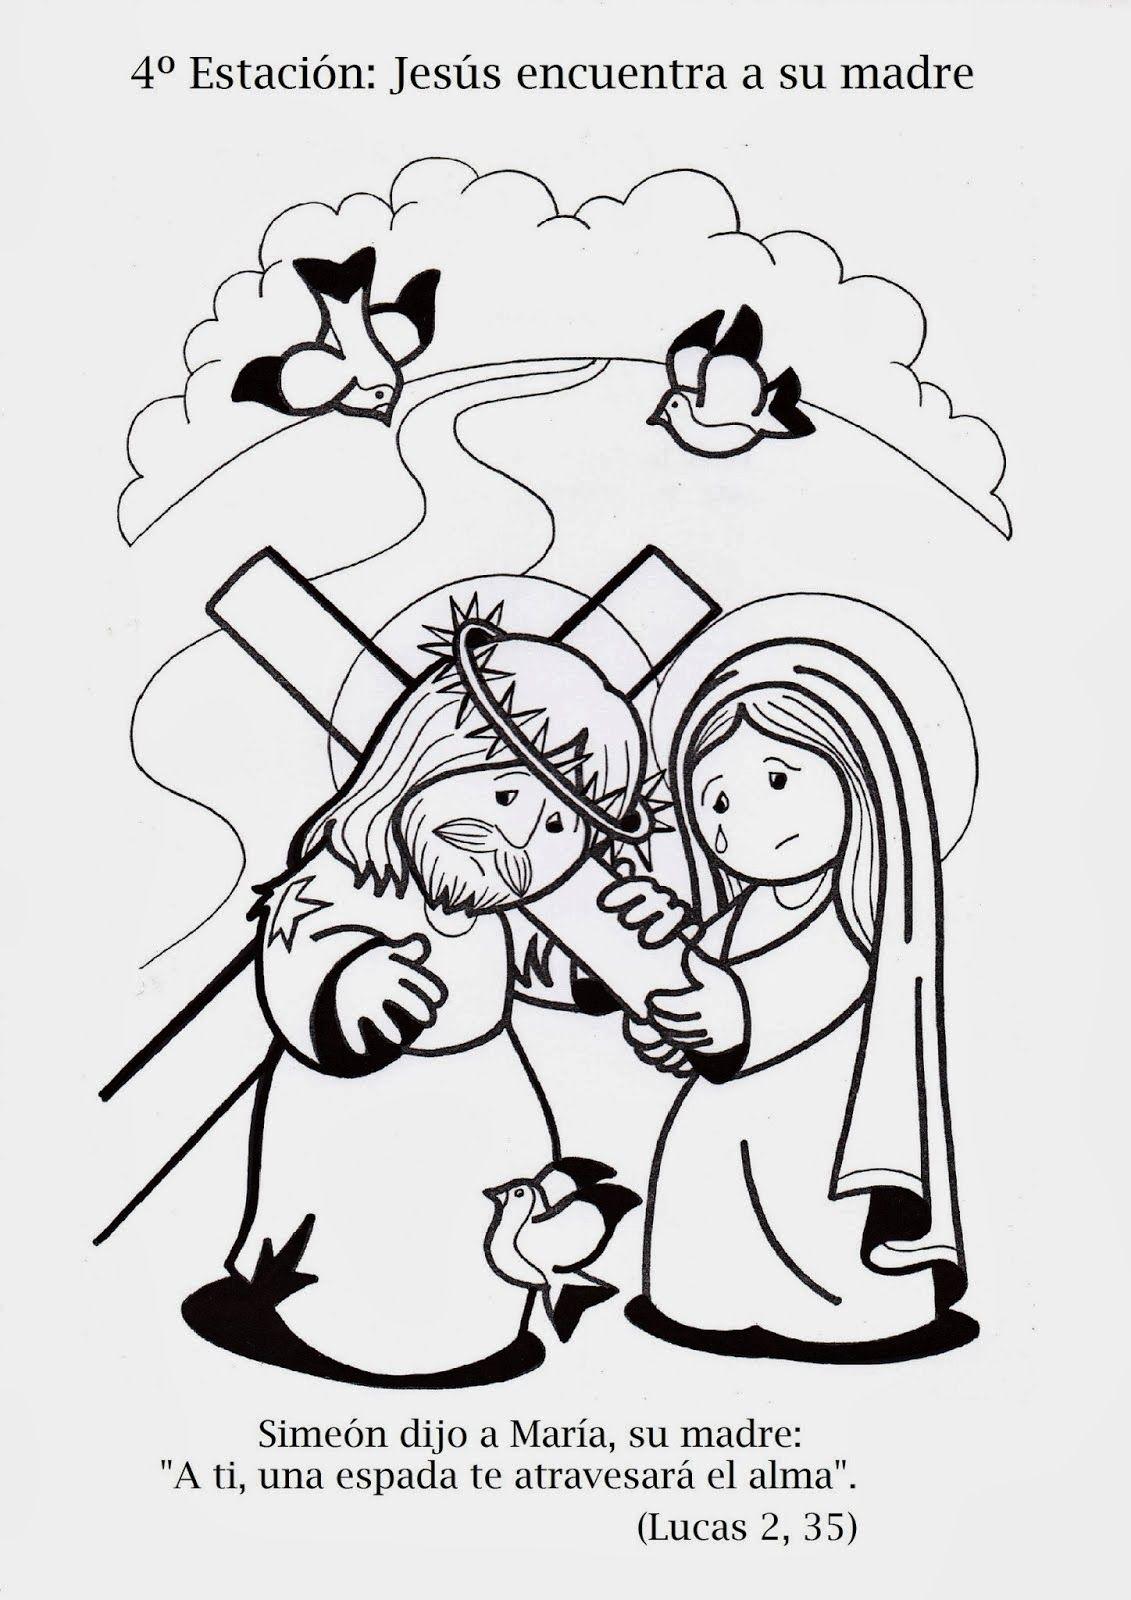 SGBlogosfera. Amigos de Jesús | Via Crucis para colorear | Pinterest ...